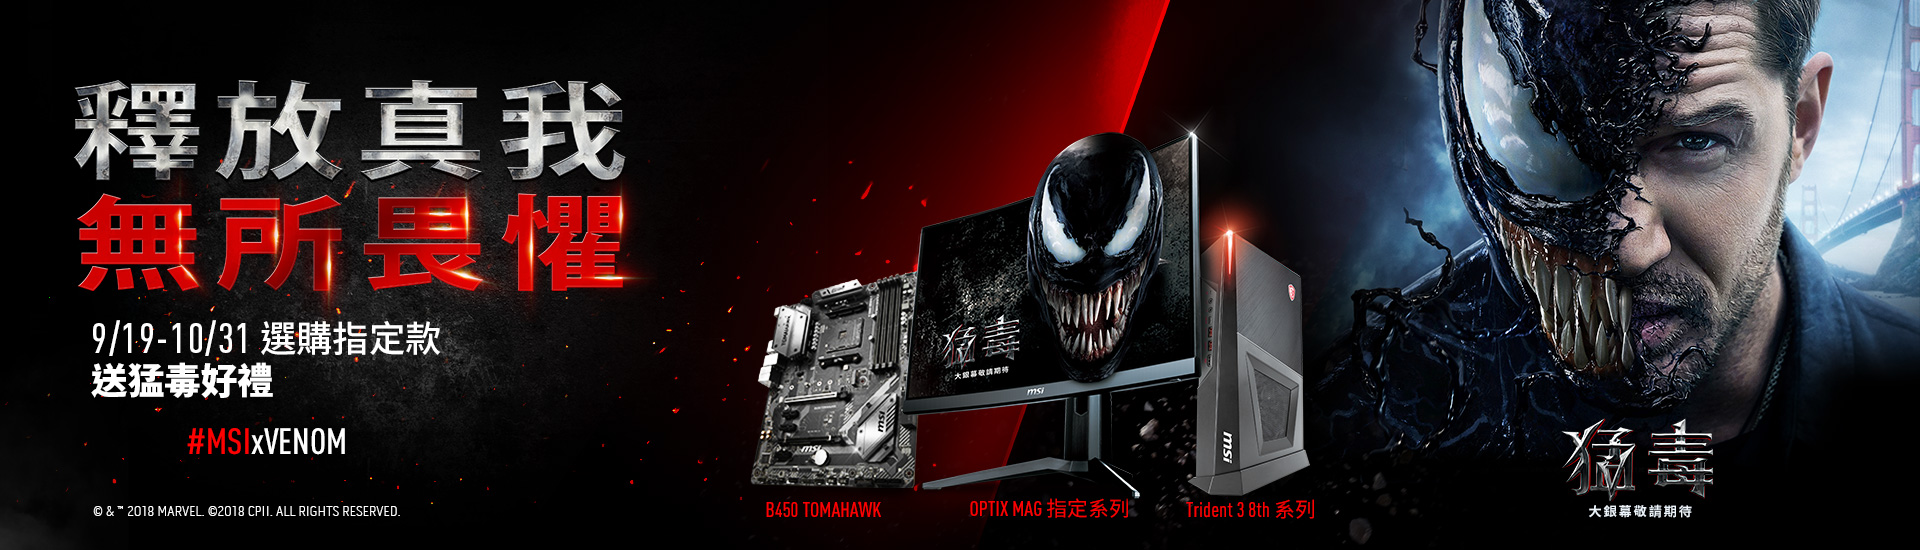 Sony Venom Co-marketing Campaign